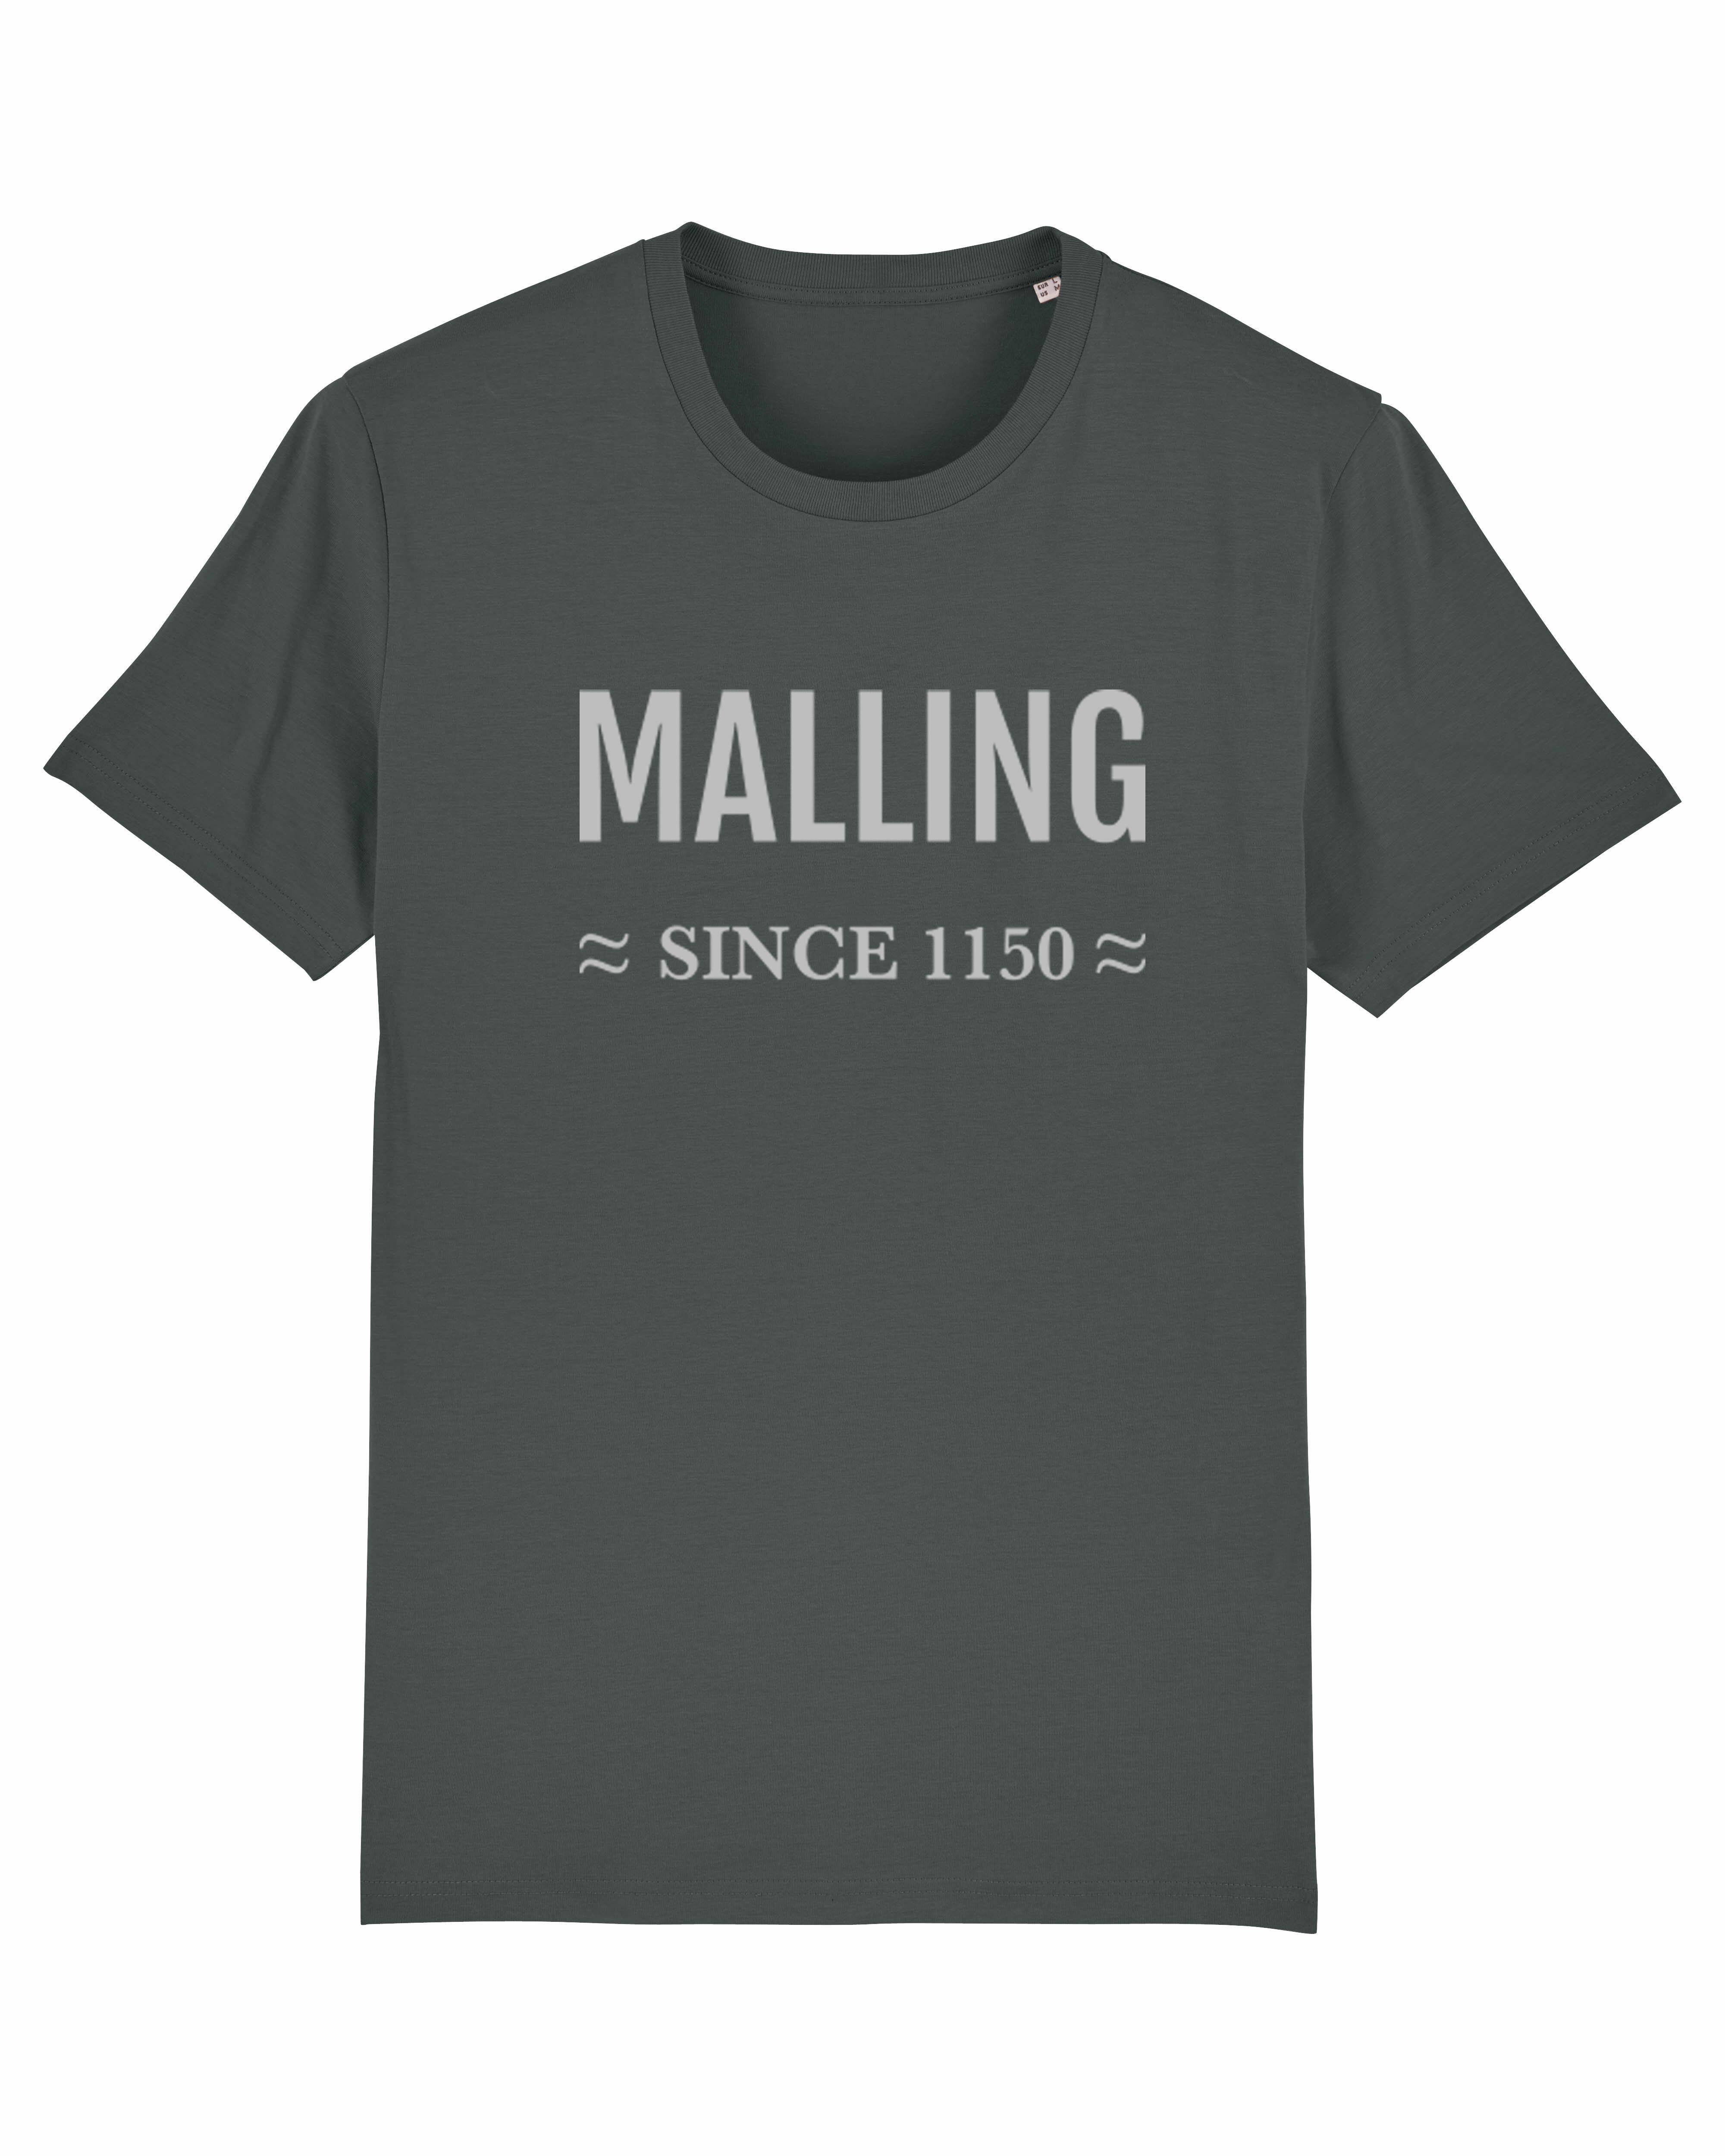 By-shirt / MALLING / VOKSEN / unisex TEE_MAL_UNI